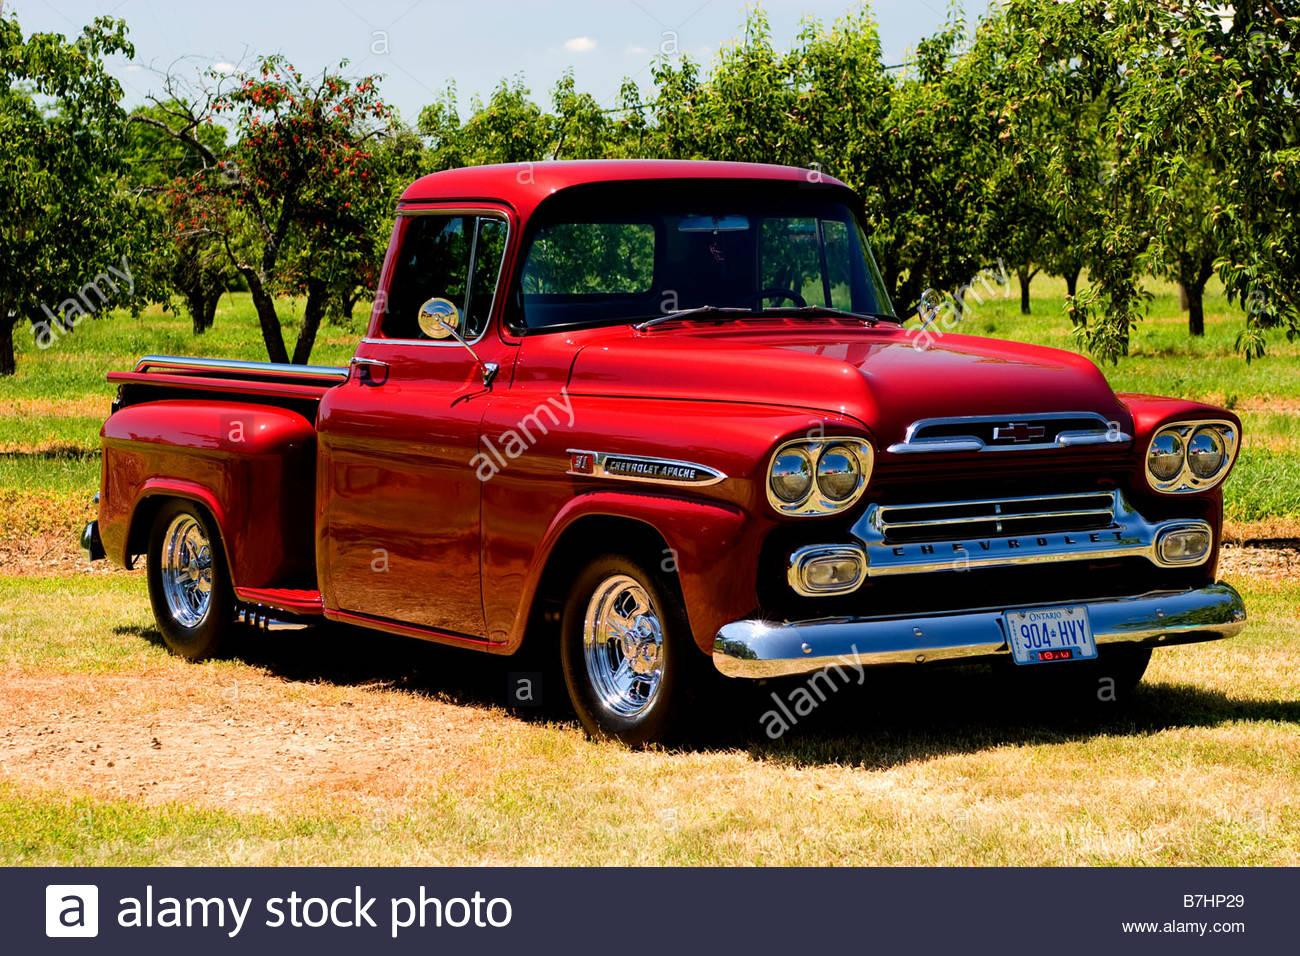 1959 Chevrolet Apache Pics, Vehicles Collection